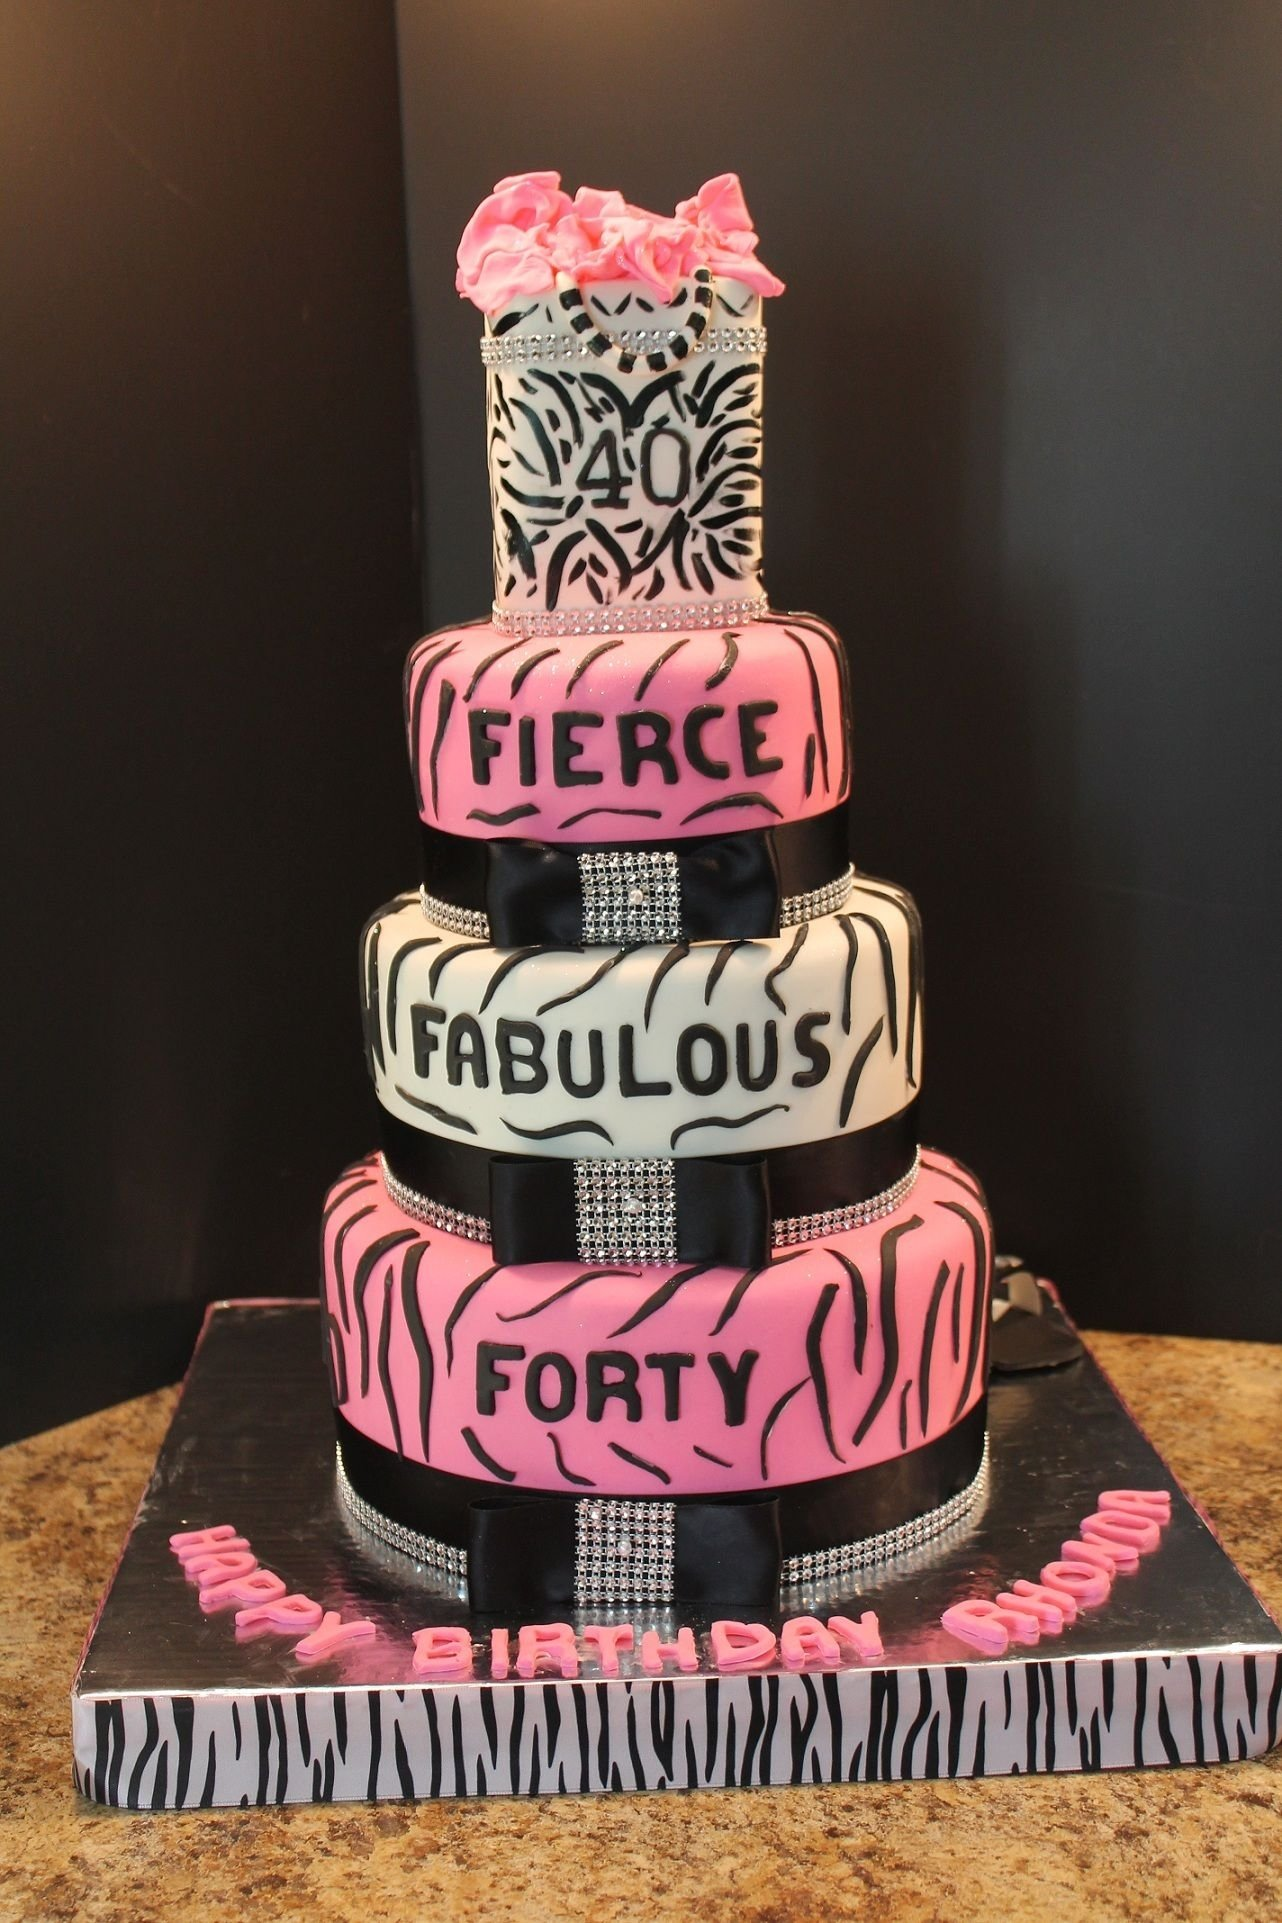 10 Famous Fun 40Th Birthday Party Ideas 40thbirthdaycake 40th birthday cake birthday cakes 40 50 4 2020